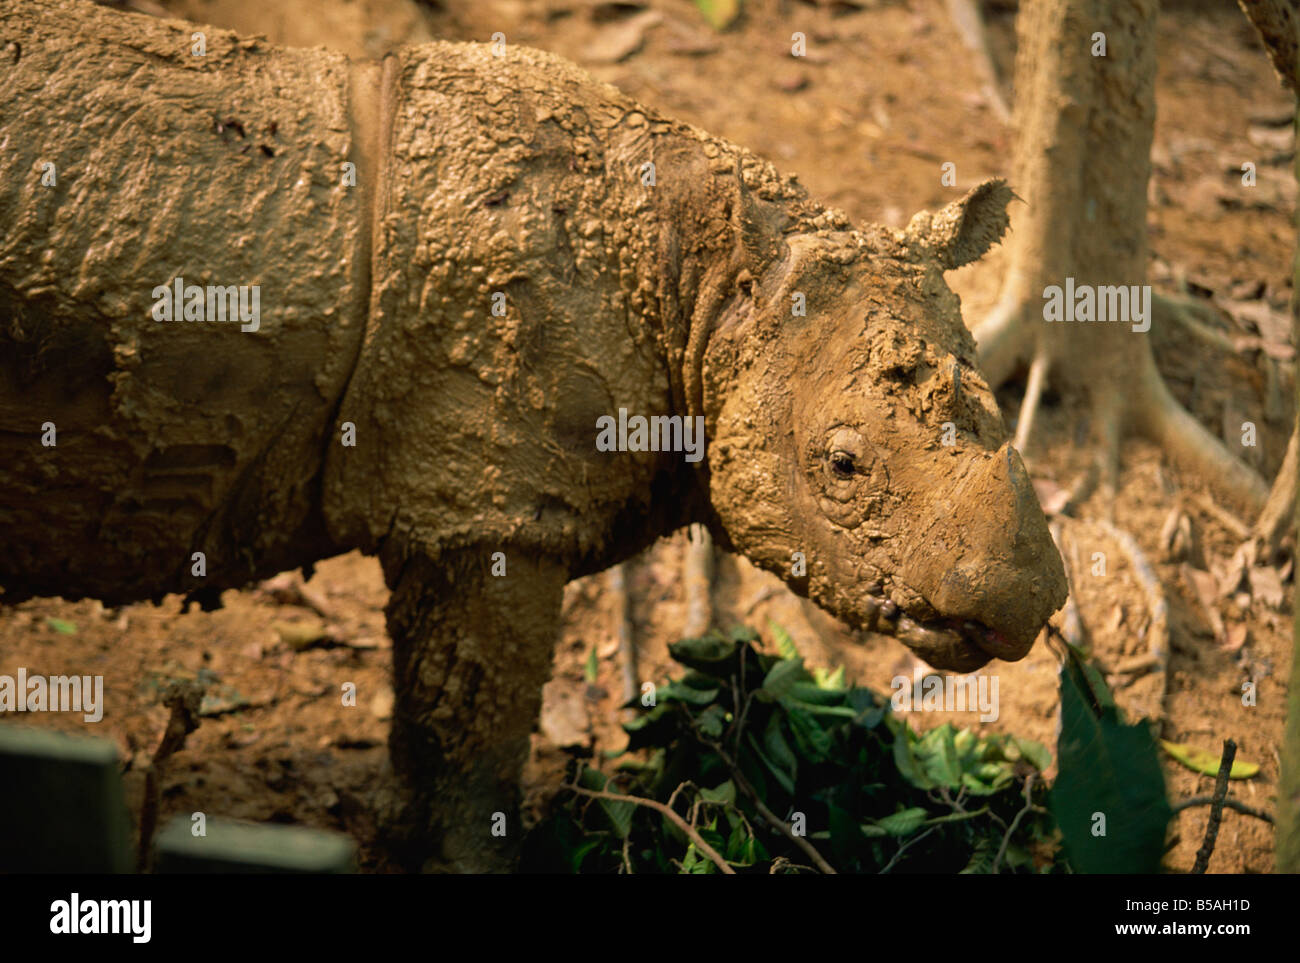 The rare hairy rhino, smallest type of rhino at Sepilok Orang-Utan Sanctuary, near Sandakan, Sabah, Malaysia, Borneo - Stock Image